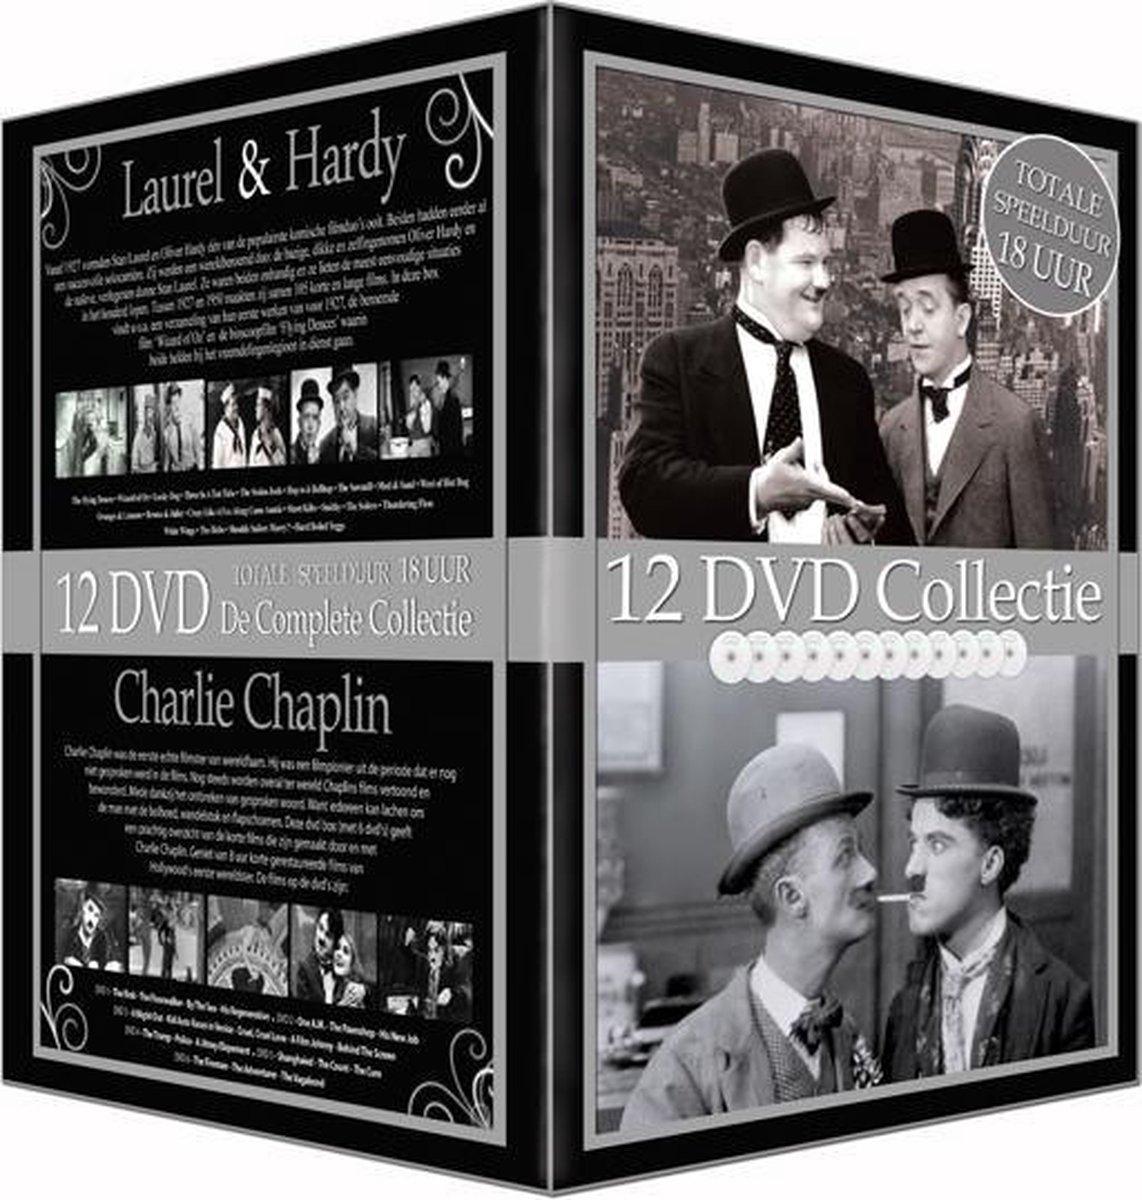 Laurel & Hardy/Charlie Chaplin 12 Dvd - Laurel & Hardy